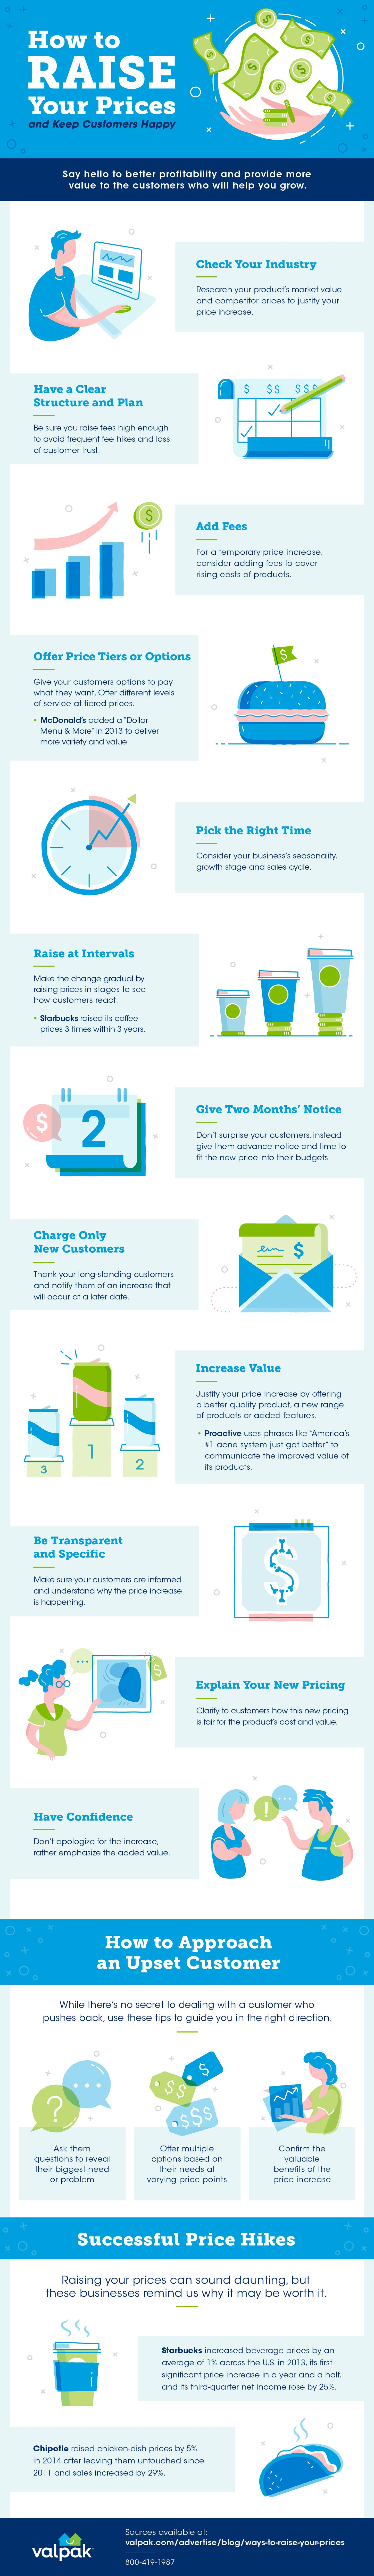 12-ways-to-raise-your-prices